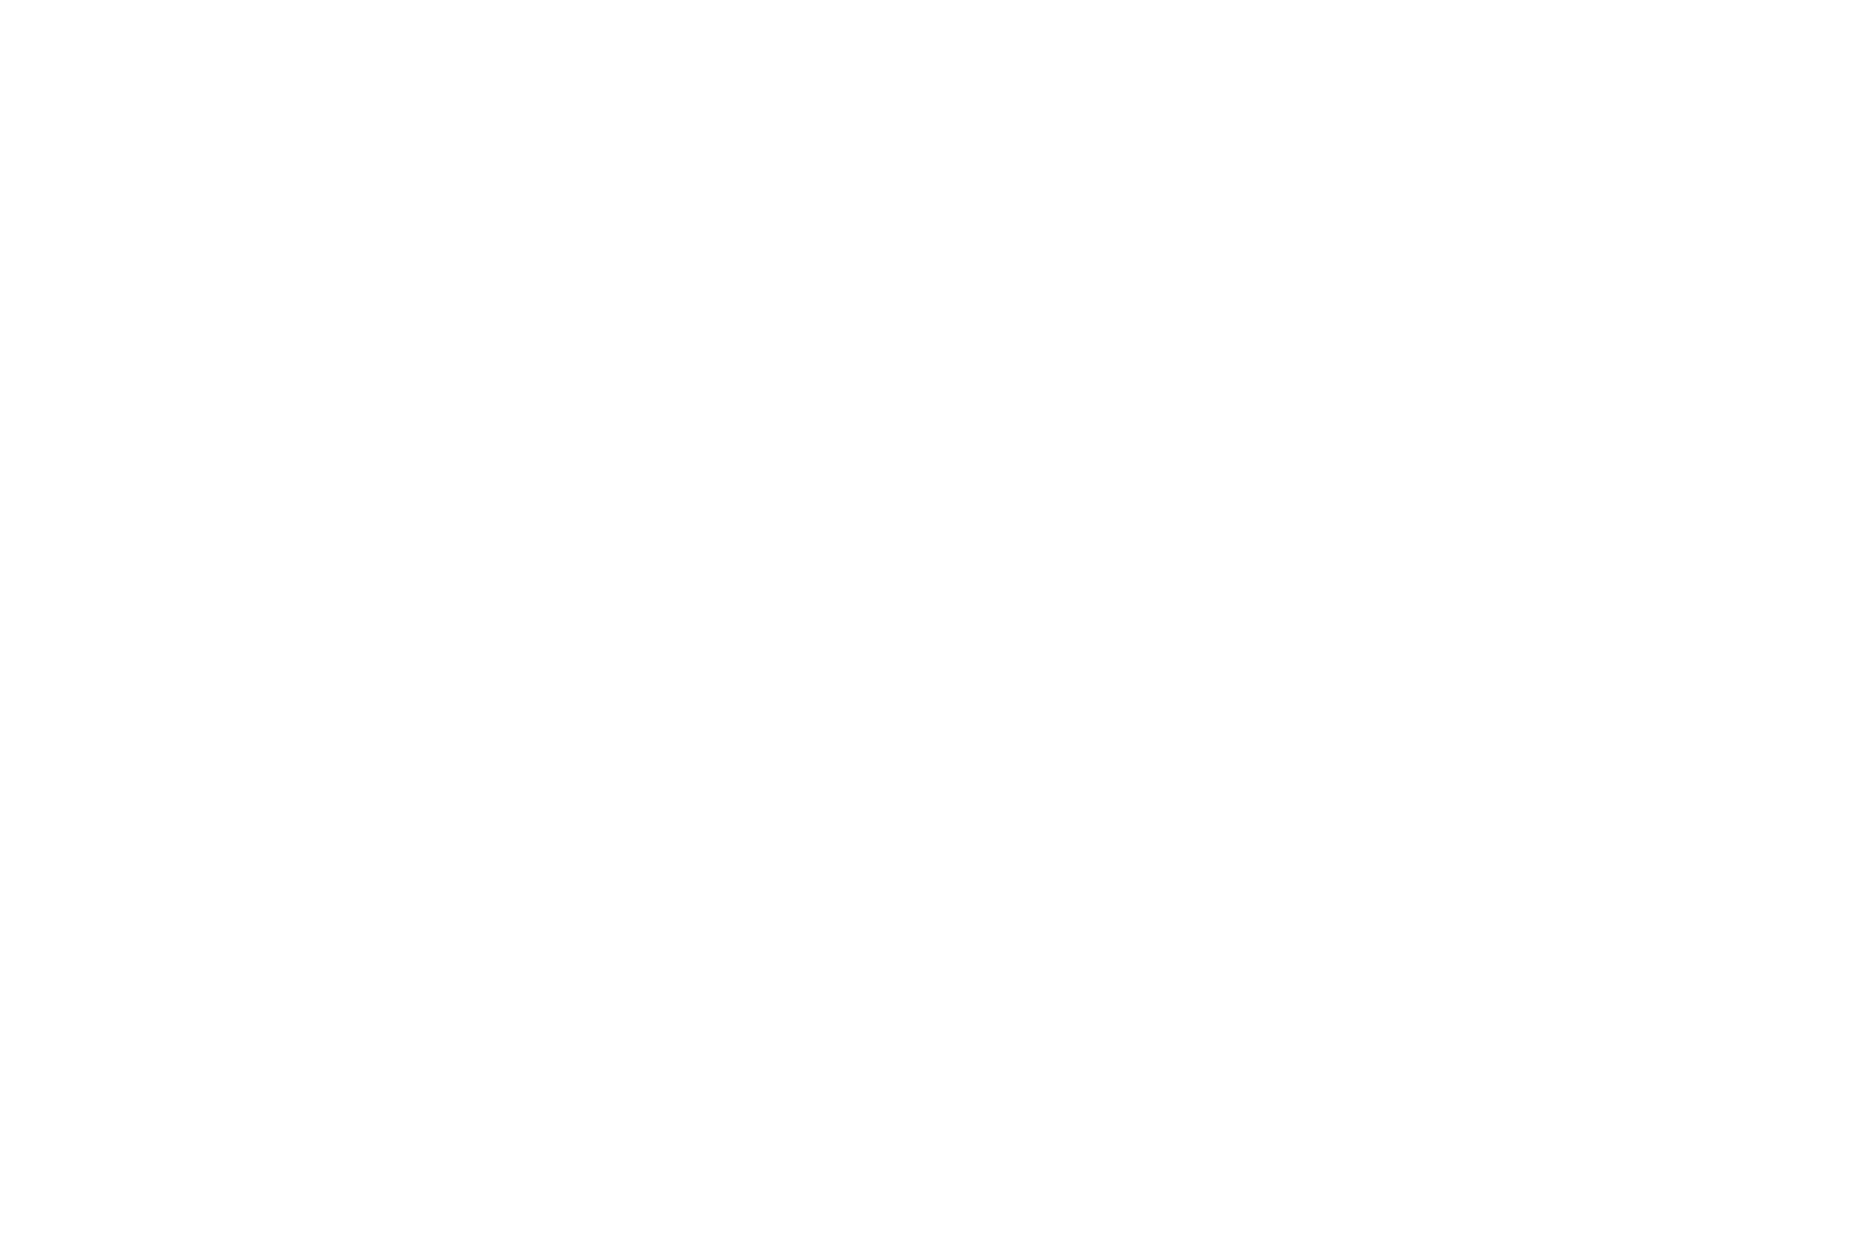 BritannicaCatalogue_2019'01_eMail-155